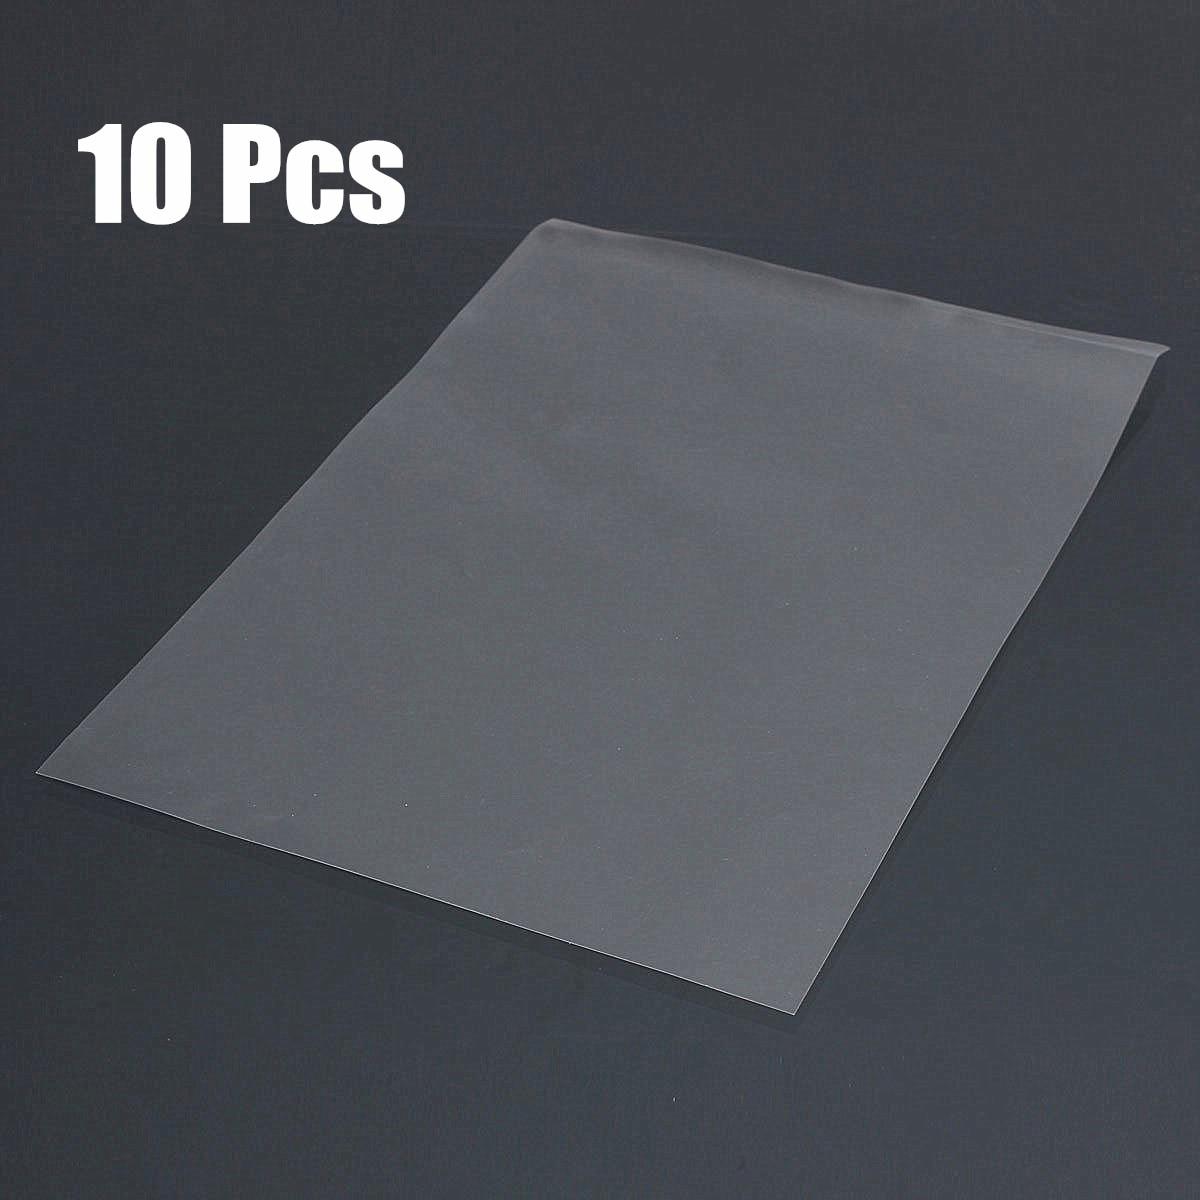 Papel de película transparente A4 de 10 piezas para impresora láser de inyección de tinta, Impresión de pantalla PCB DIY